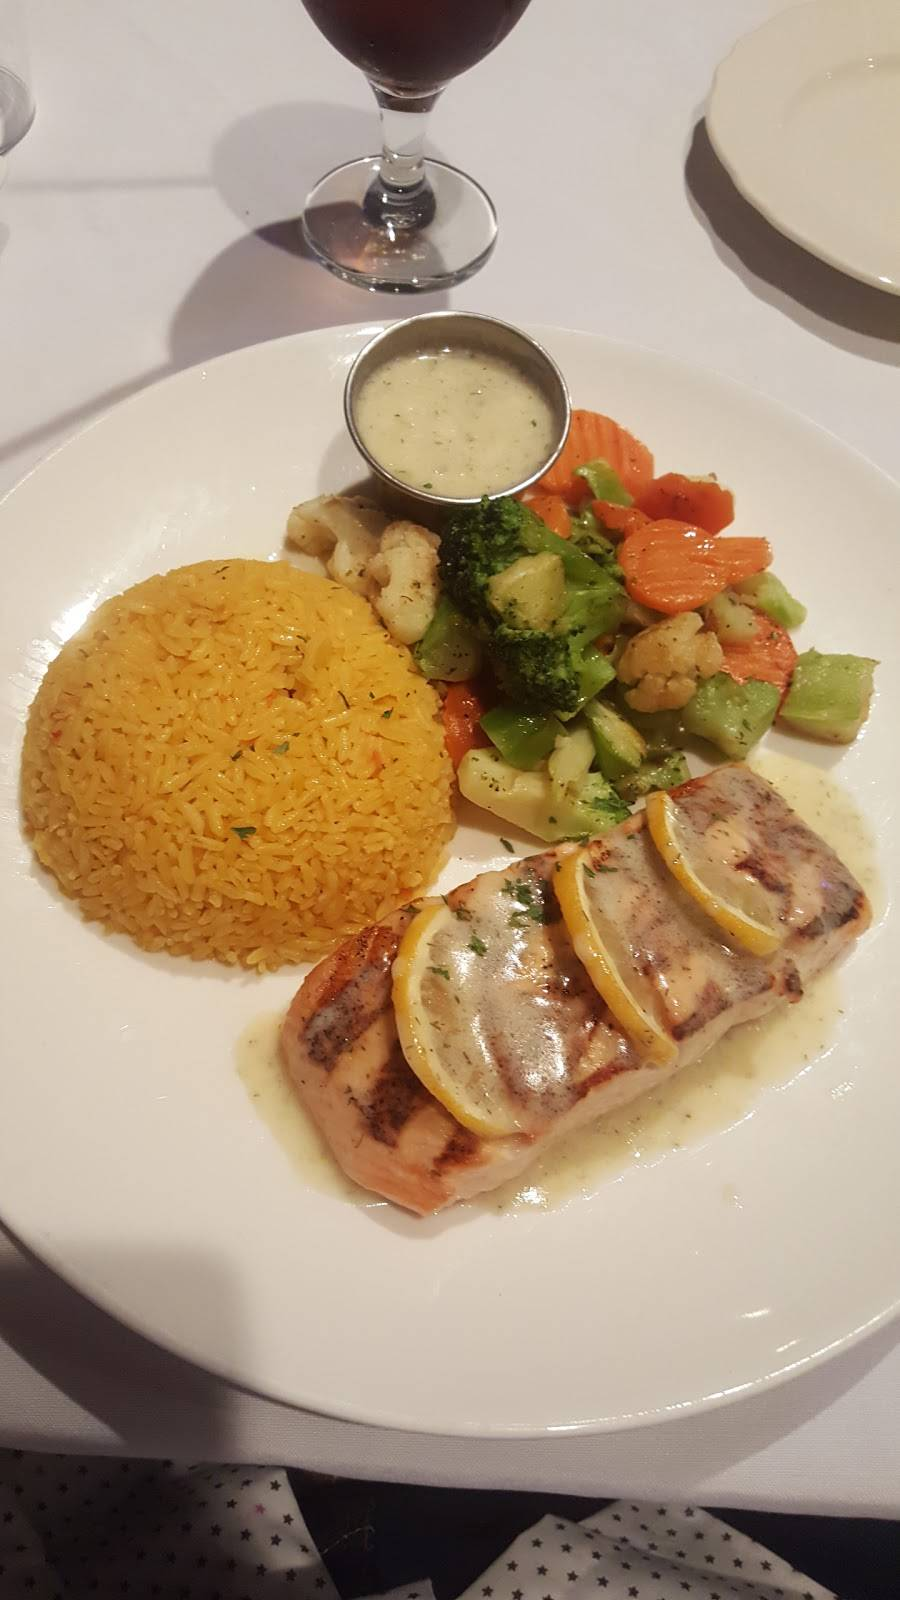 Lido | restaurant | 2600 Tonnelle Ave, North Bergen, NJ 07047, USA | 2013308000 OR +1 201-330-8000